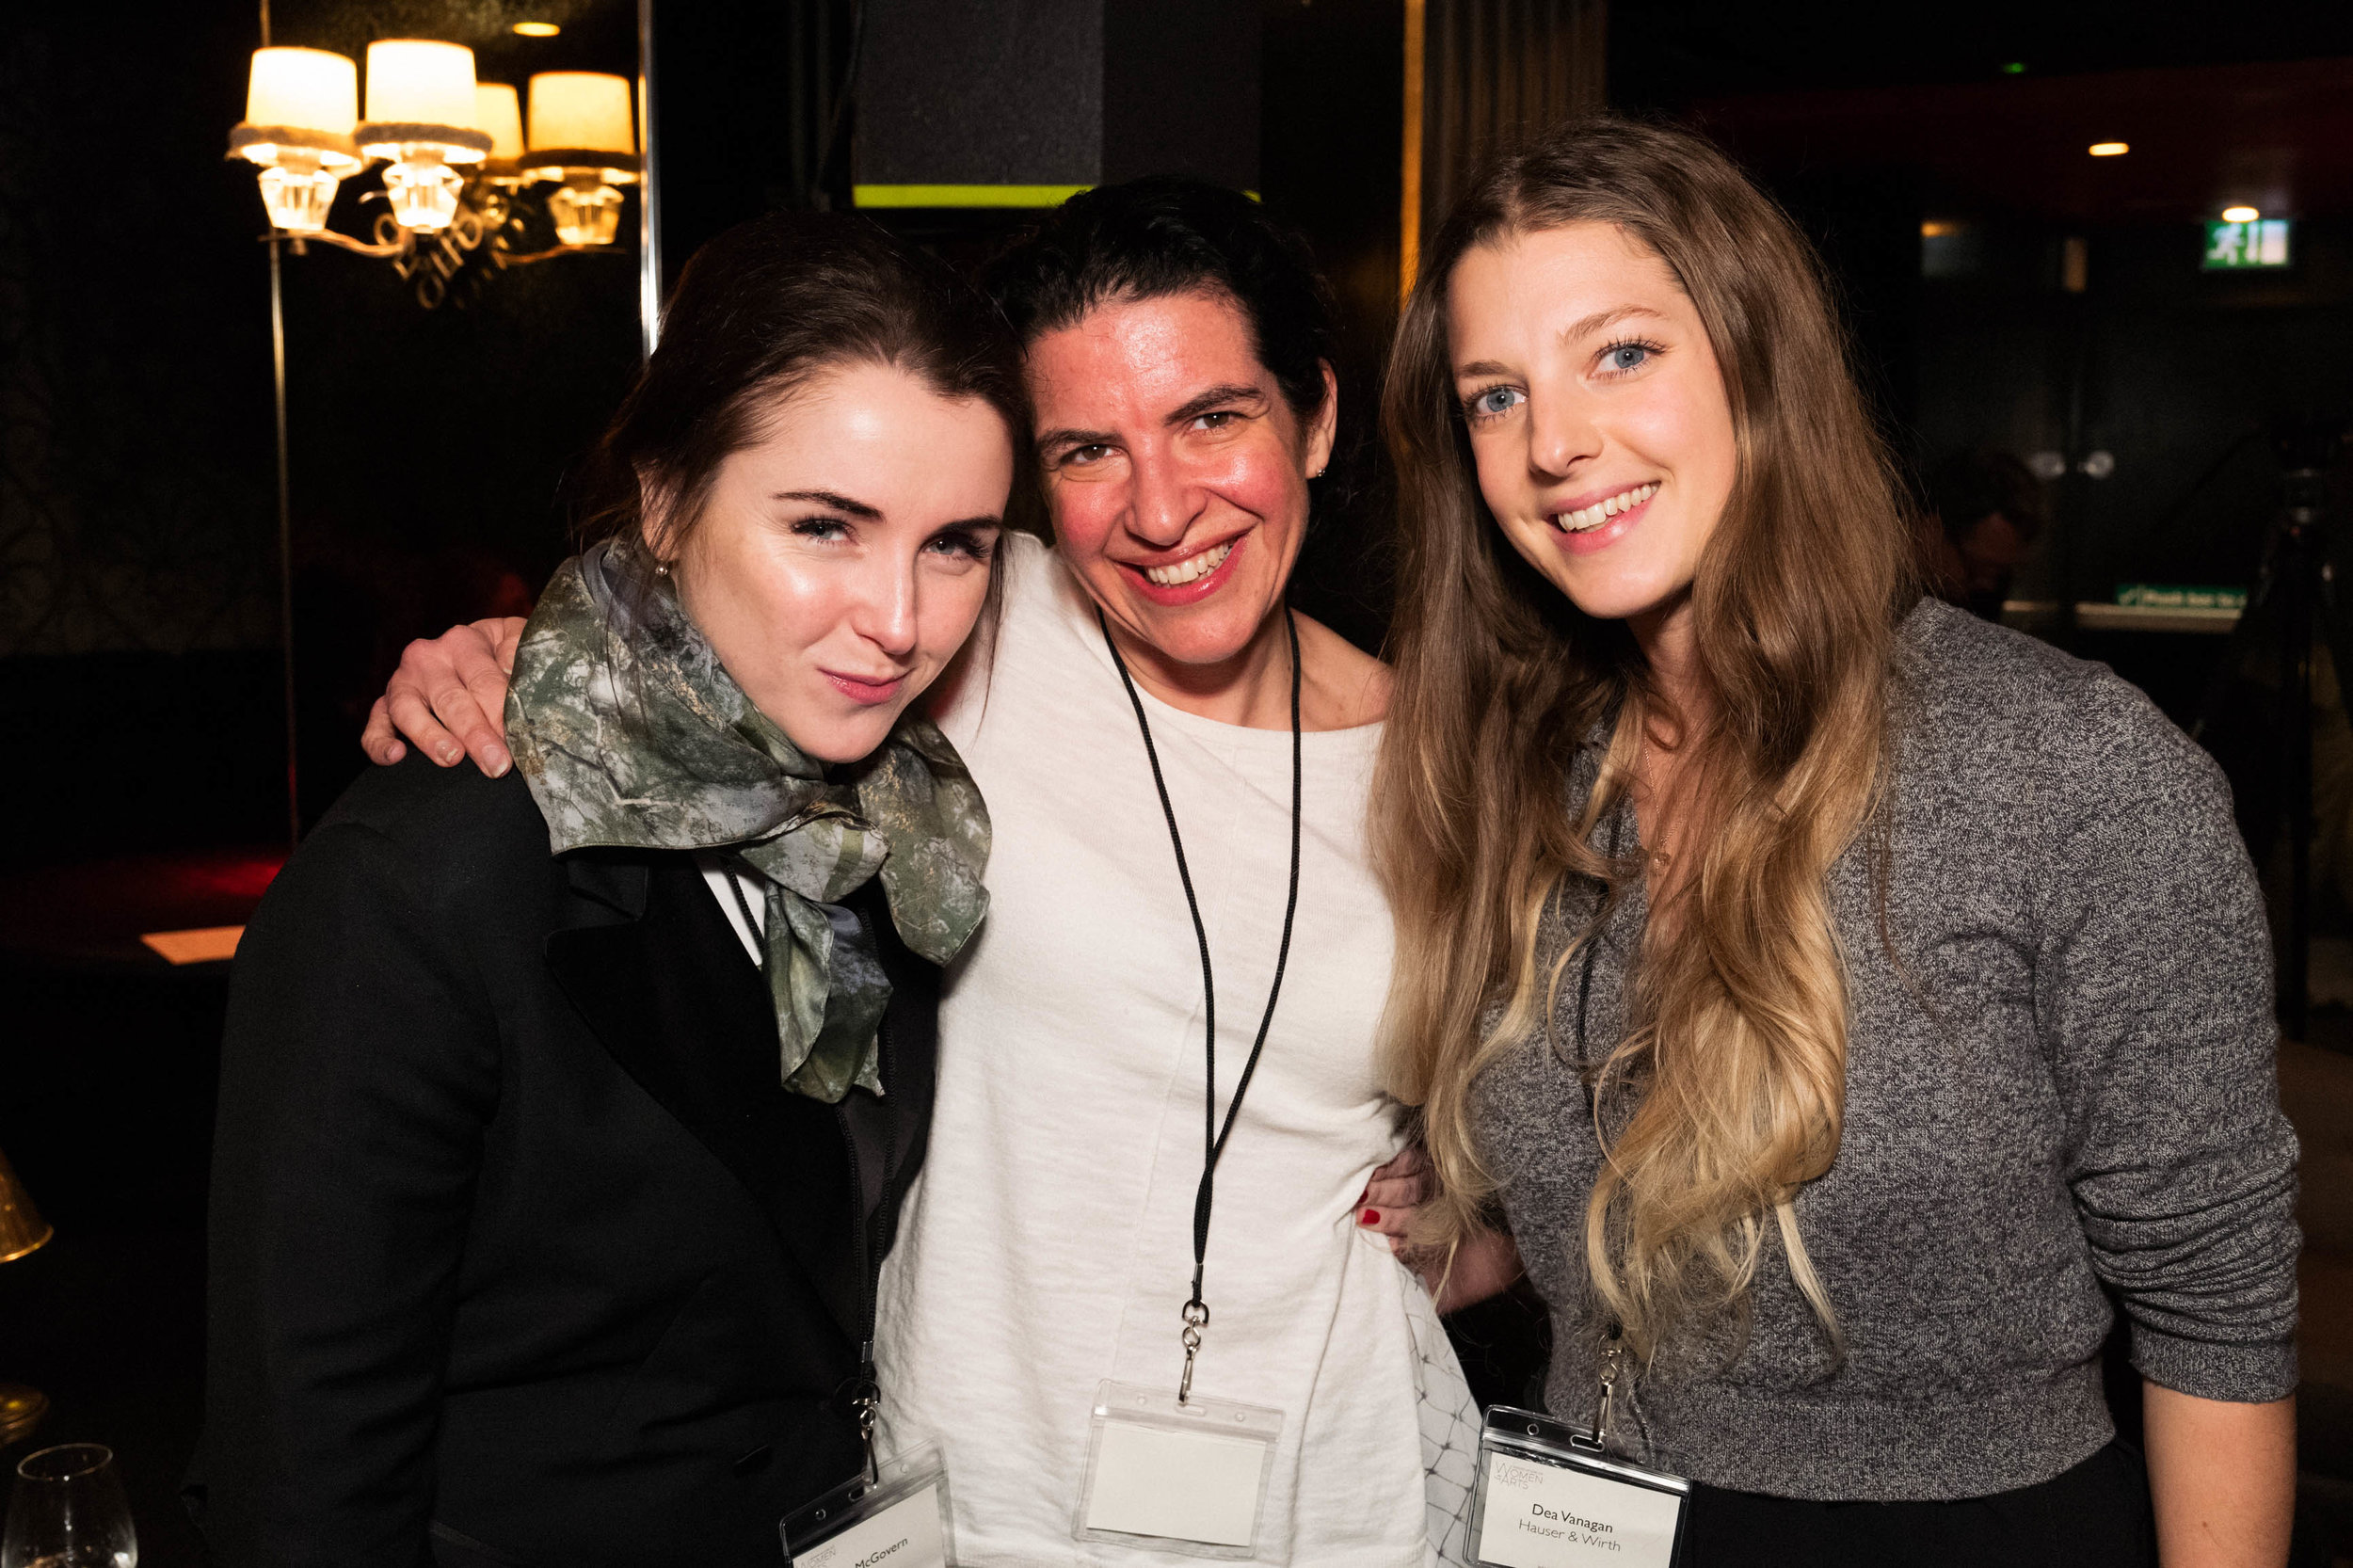 Fiona McGovern, Melanie Gerlis and Dea Vanagan